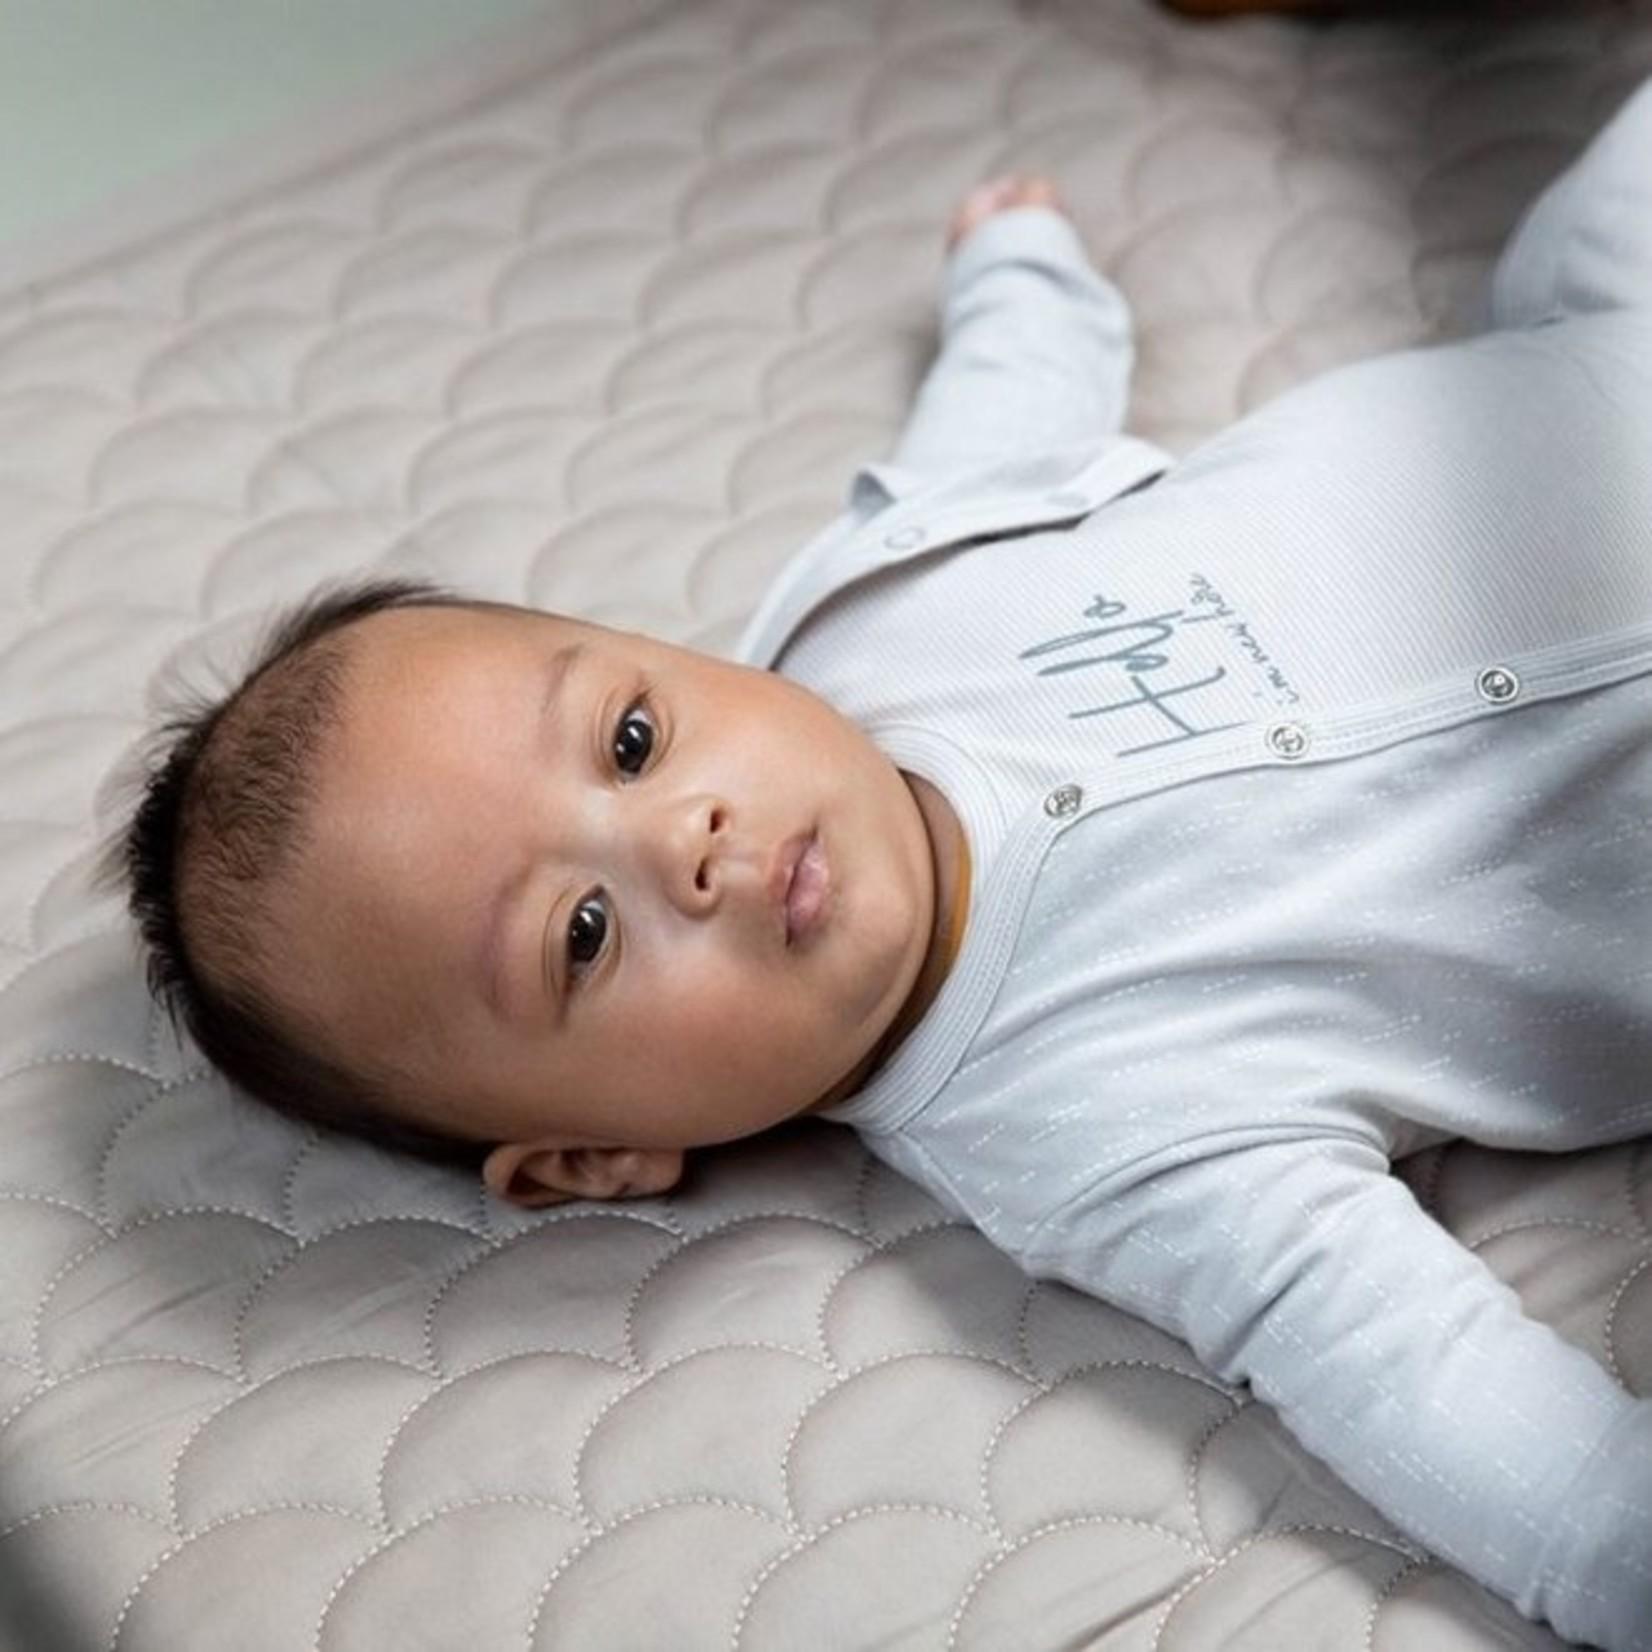 Dirkje Unisex babypakje 3-delig lichtgrijs en ecru